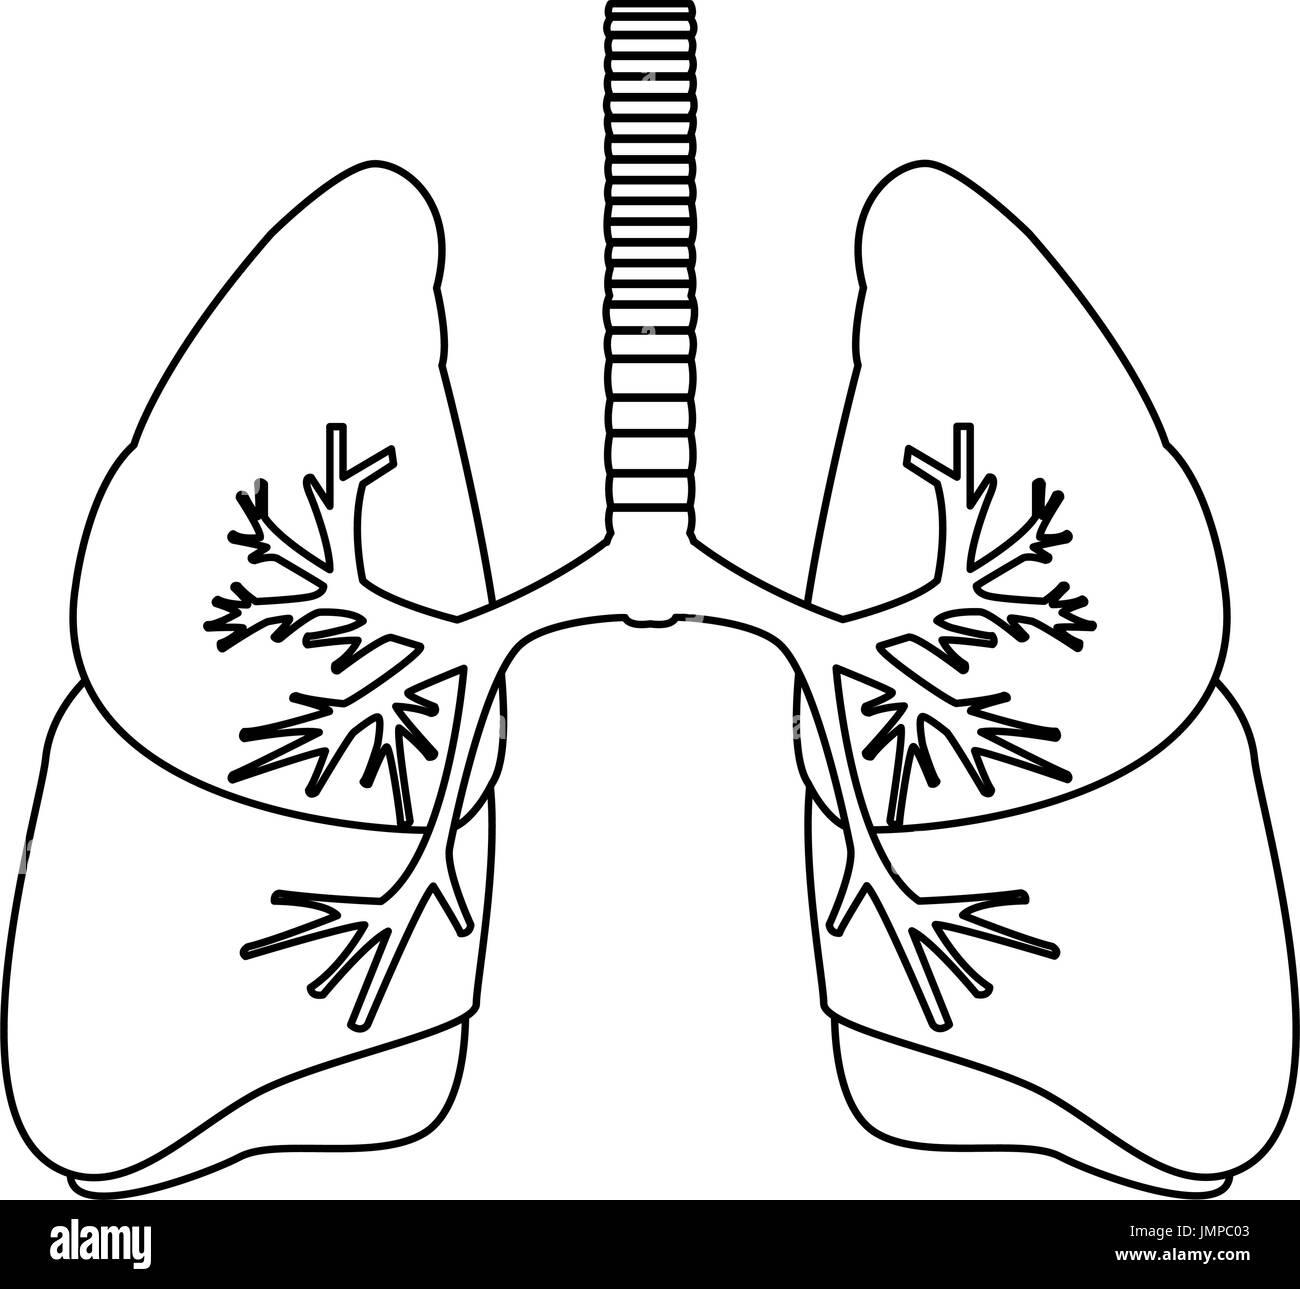 Human lungs anatomy stock vector art illustration vector image human lungs anatomy ccuart Choice Image